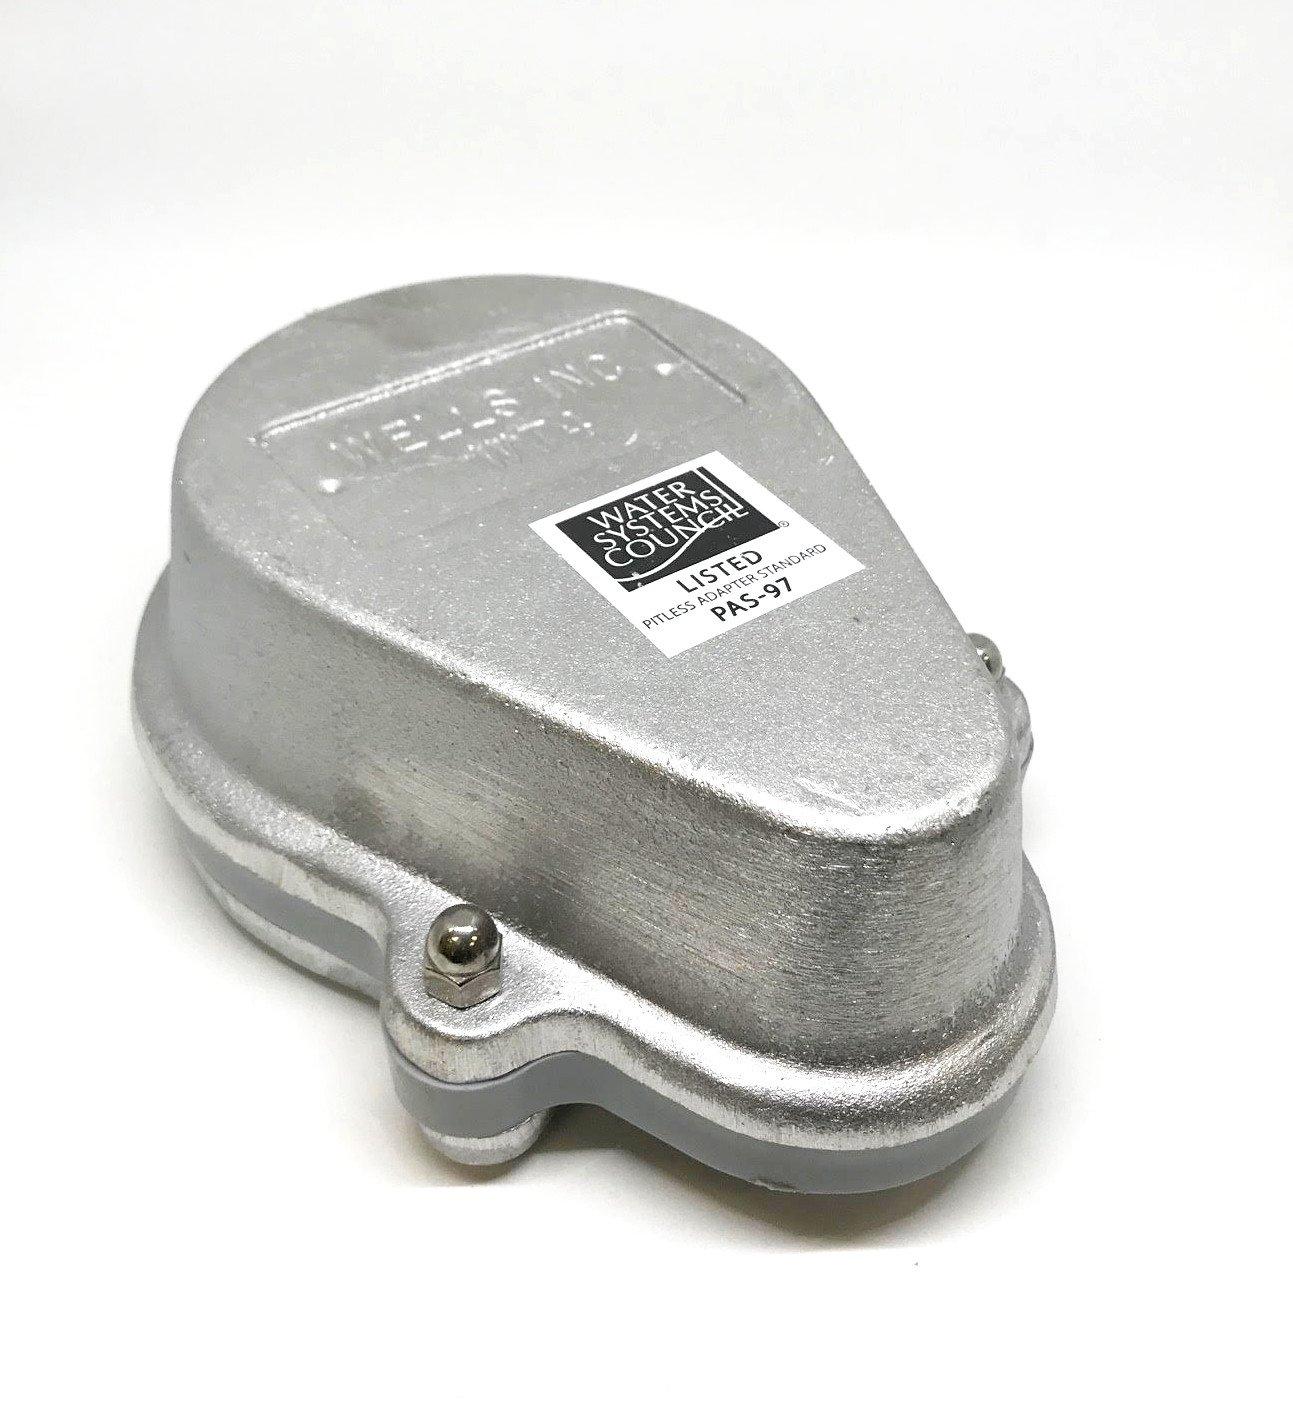 Campbell Mfg WT4 4'' Aluminum Watertight Well Cap for 4-1/2'' OD Casings